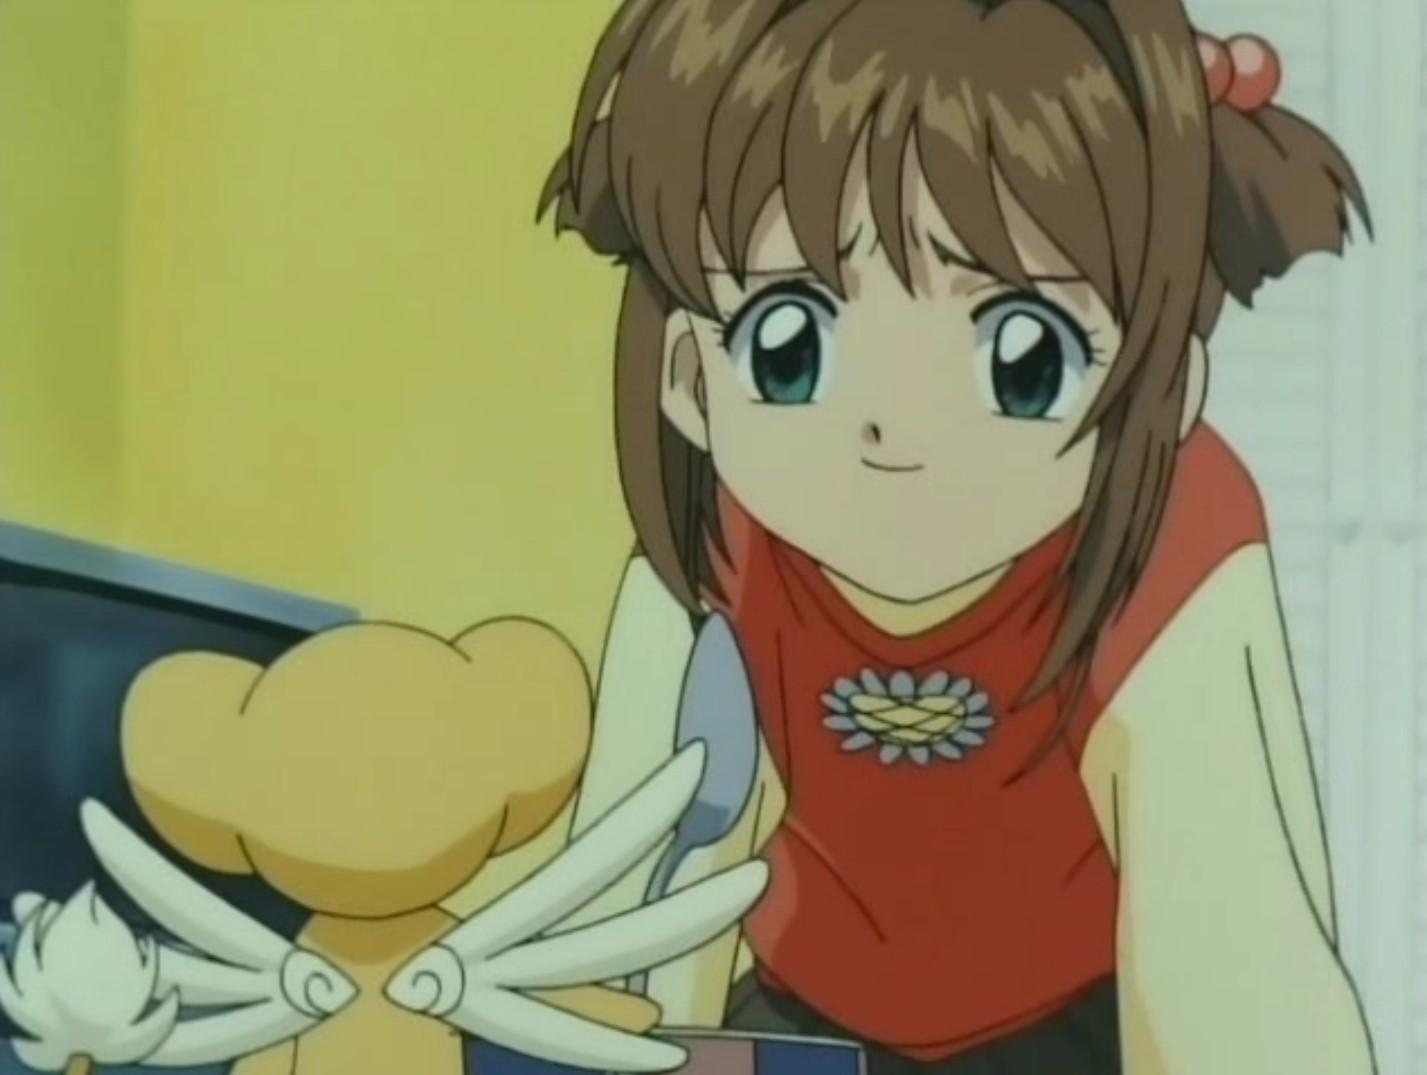 Assistir Sakura Card Captors Dublado, Sakura Card Captors Dublado - Episódio 23, Sakura Card Captors Dublado, HD, Sakura Card Captors Dublado - Episódio 23